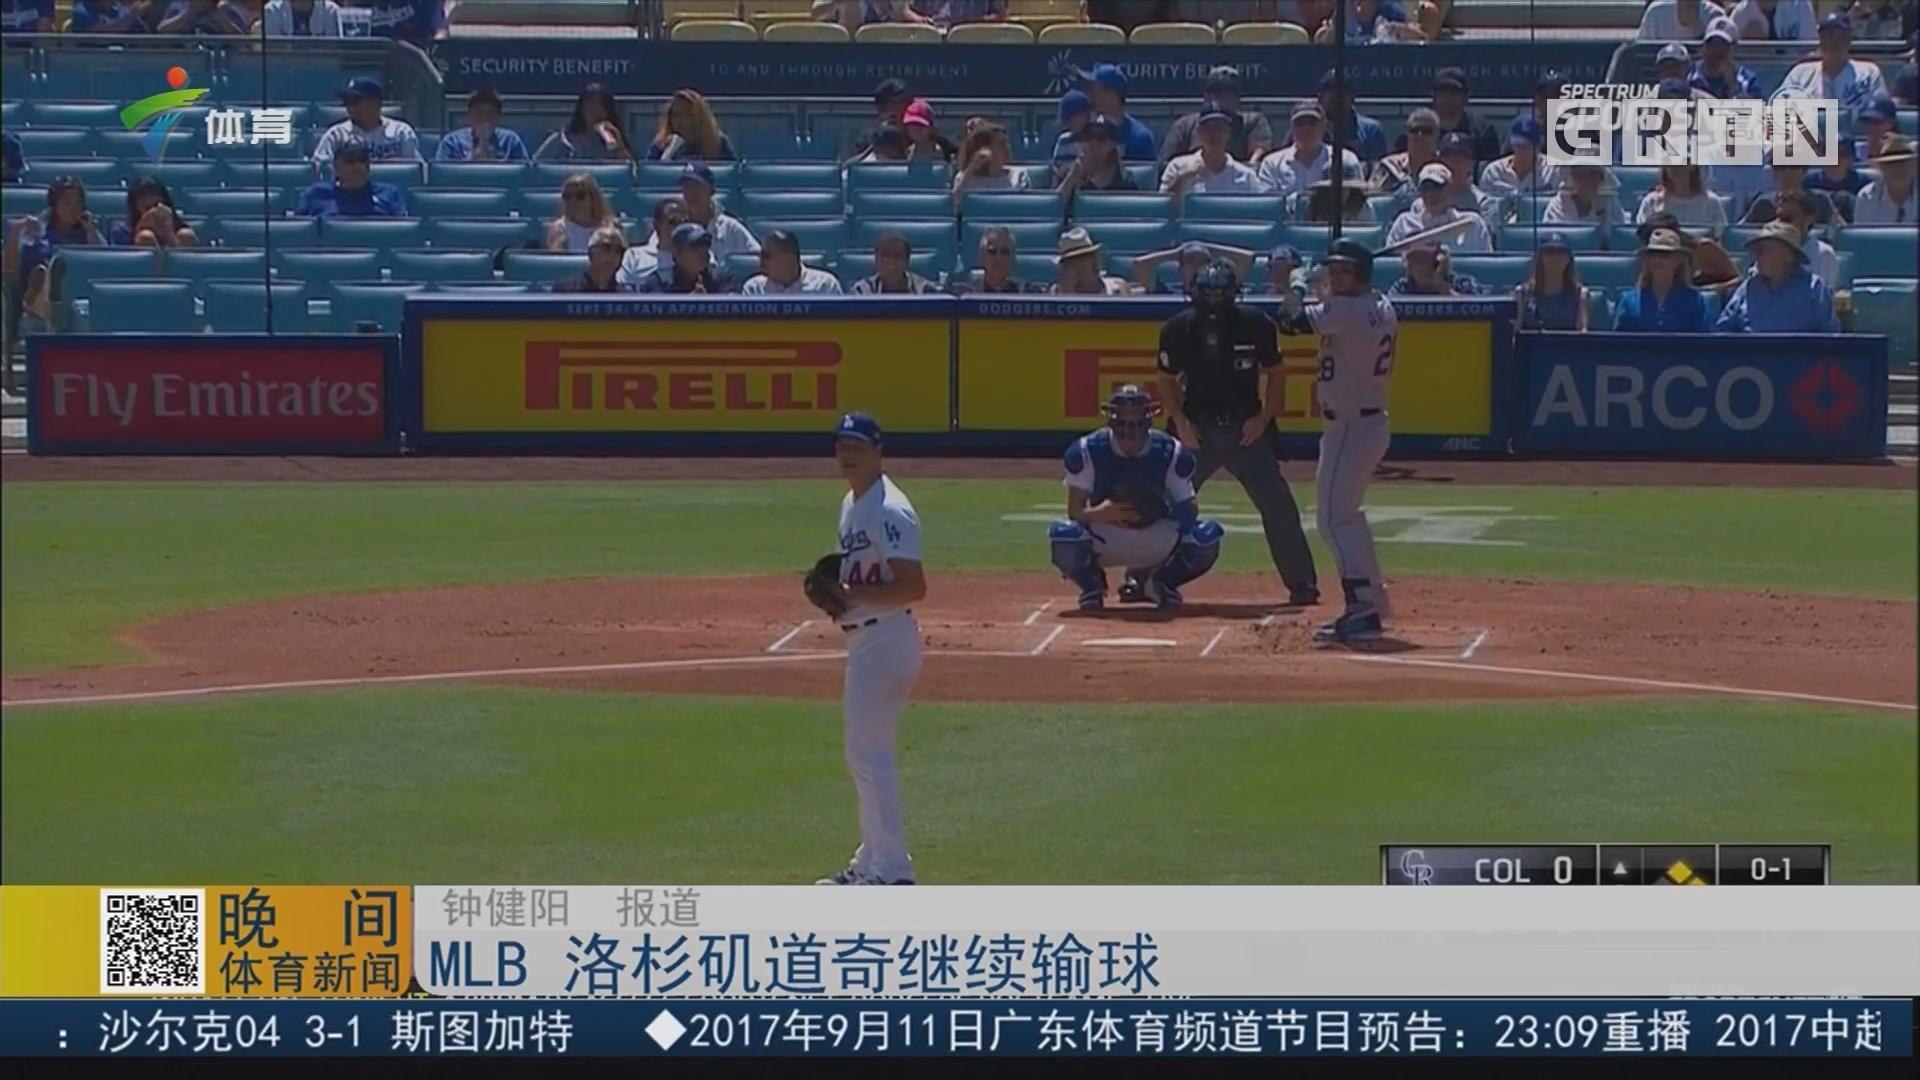 MLB 洛杉矶道奇继续输球